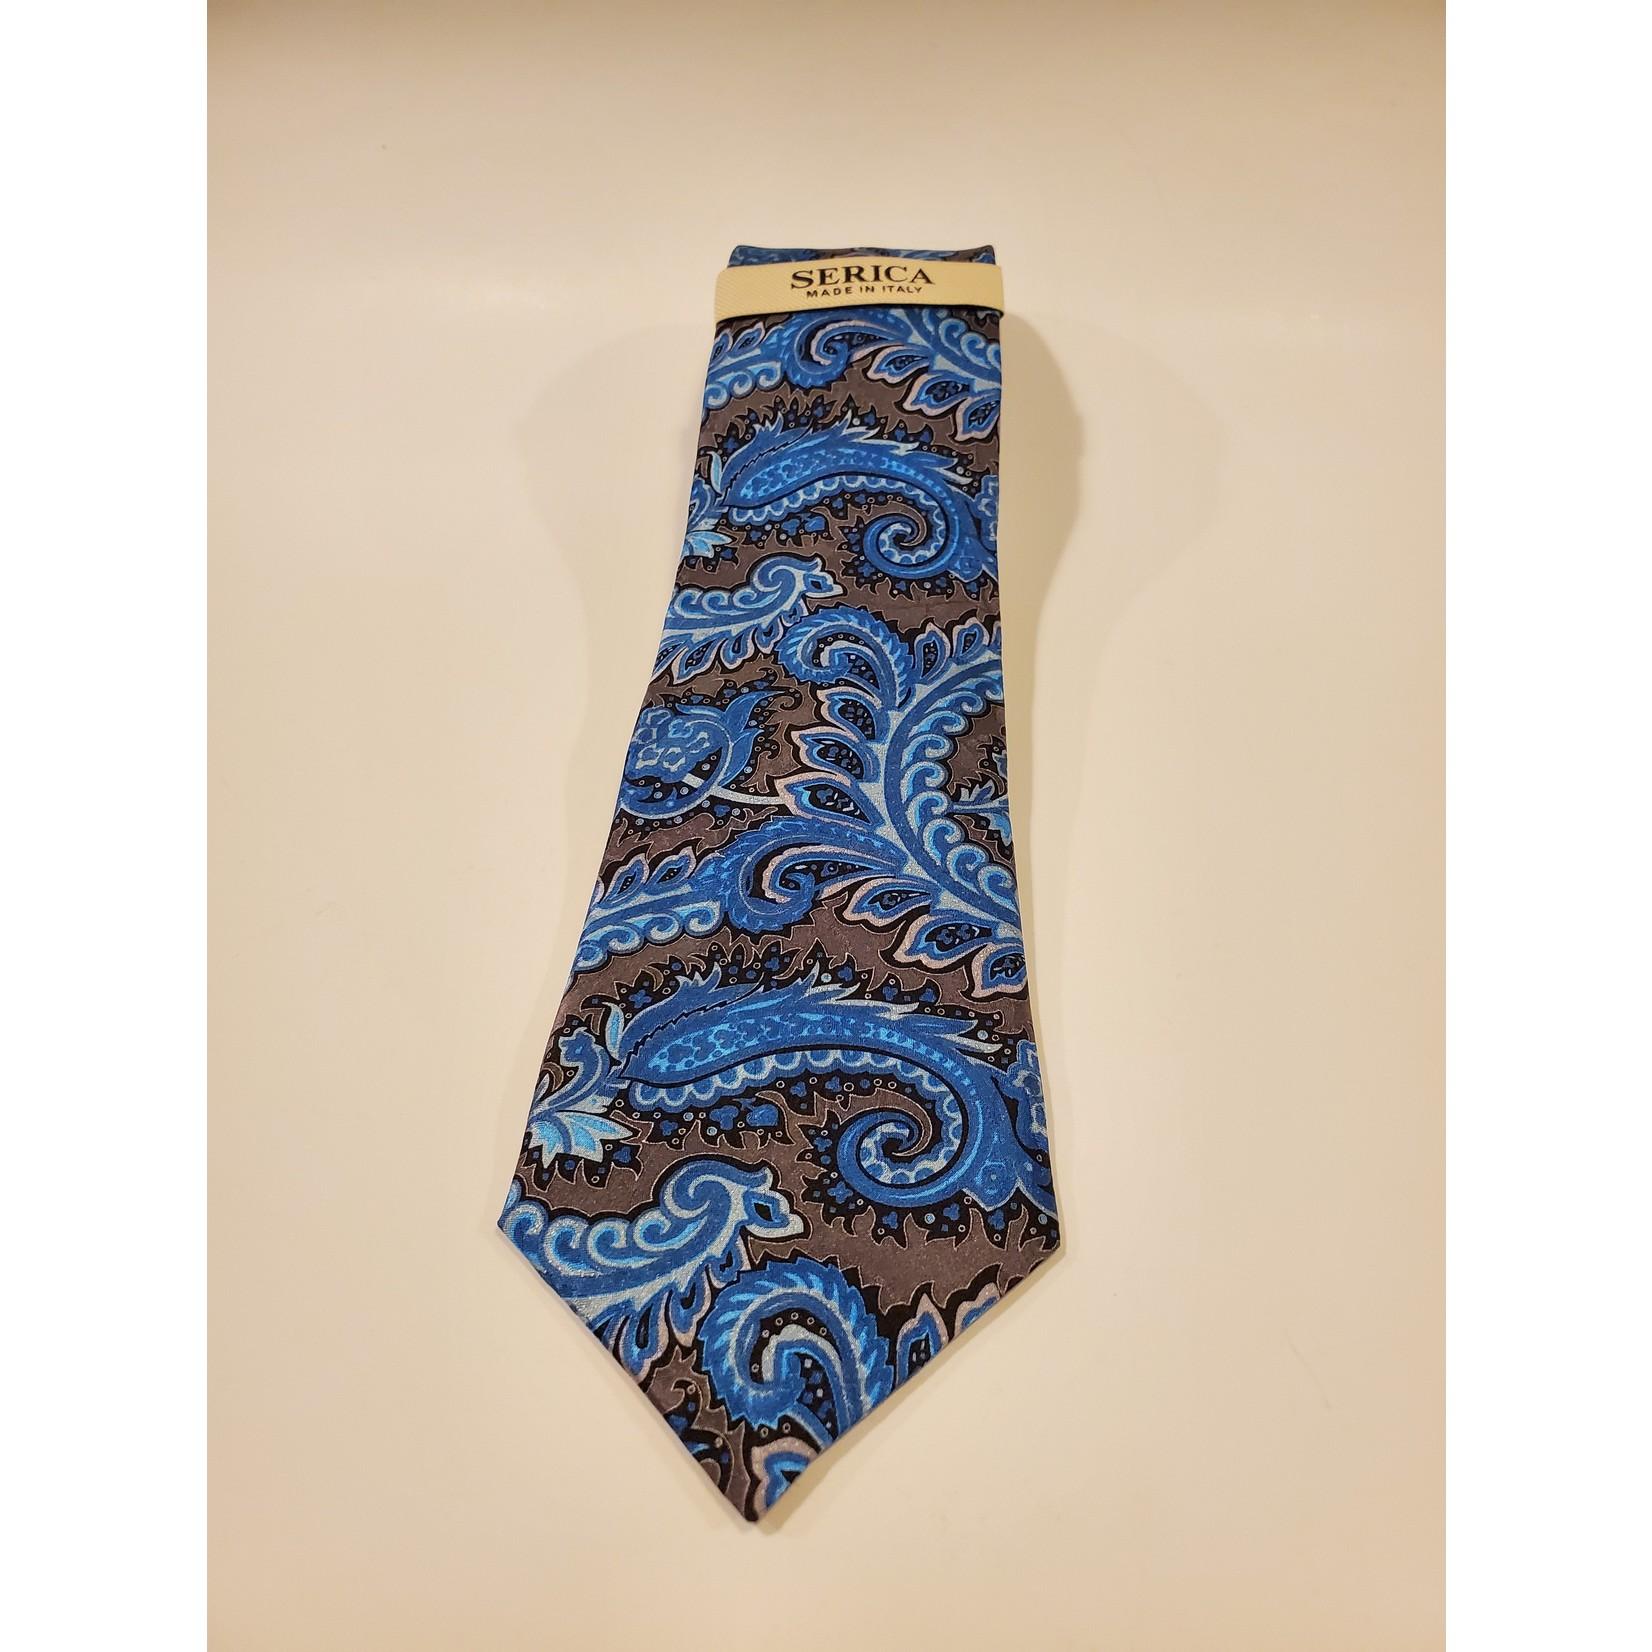 Serica 193268 Printed Silk Tie A - Blue/ Grey Large Paisley